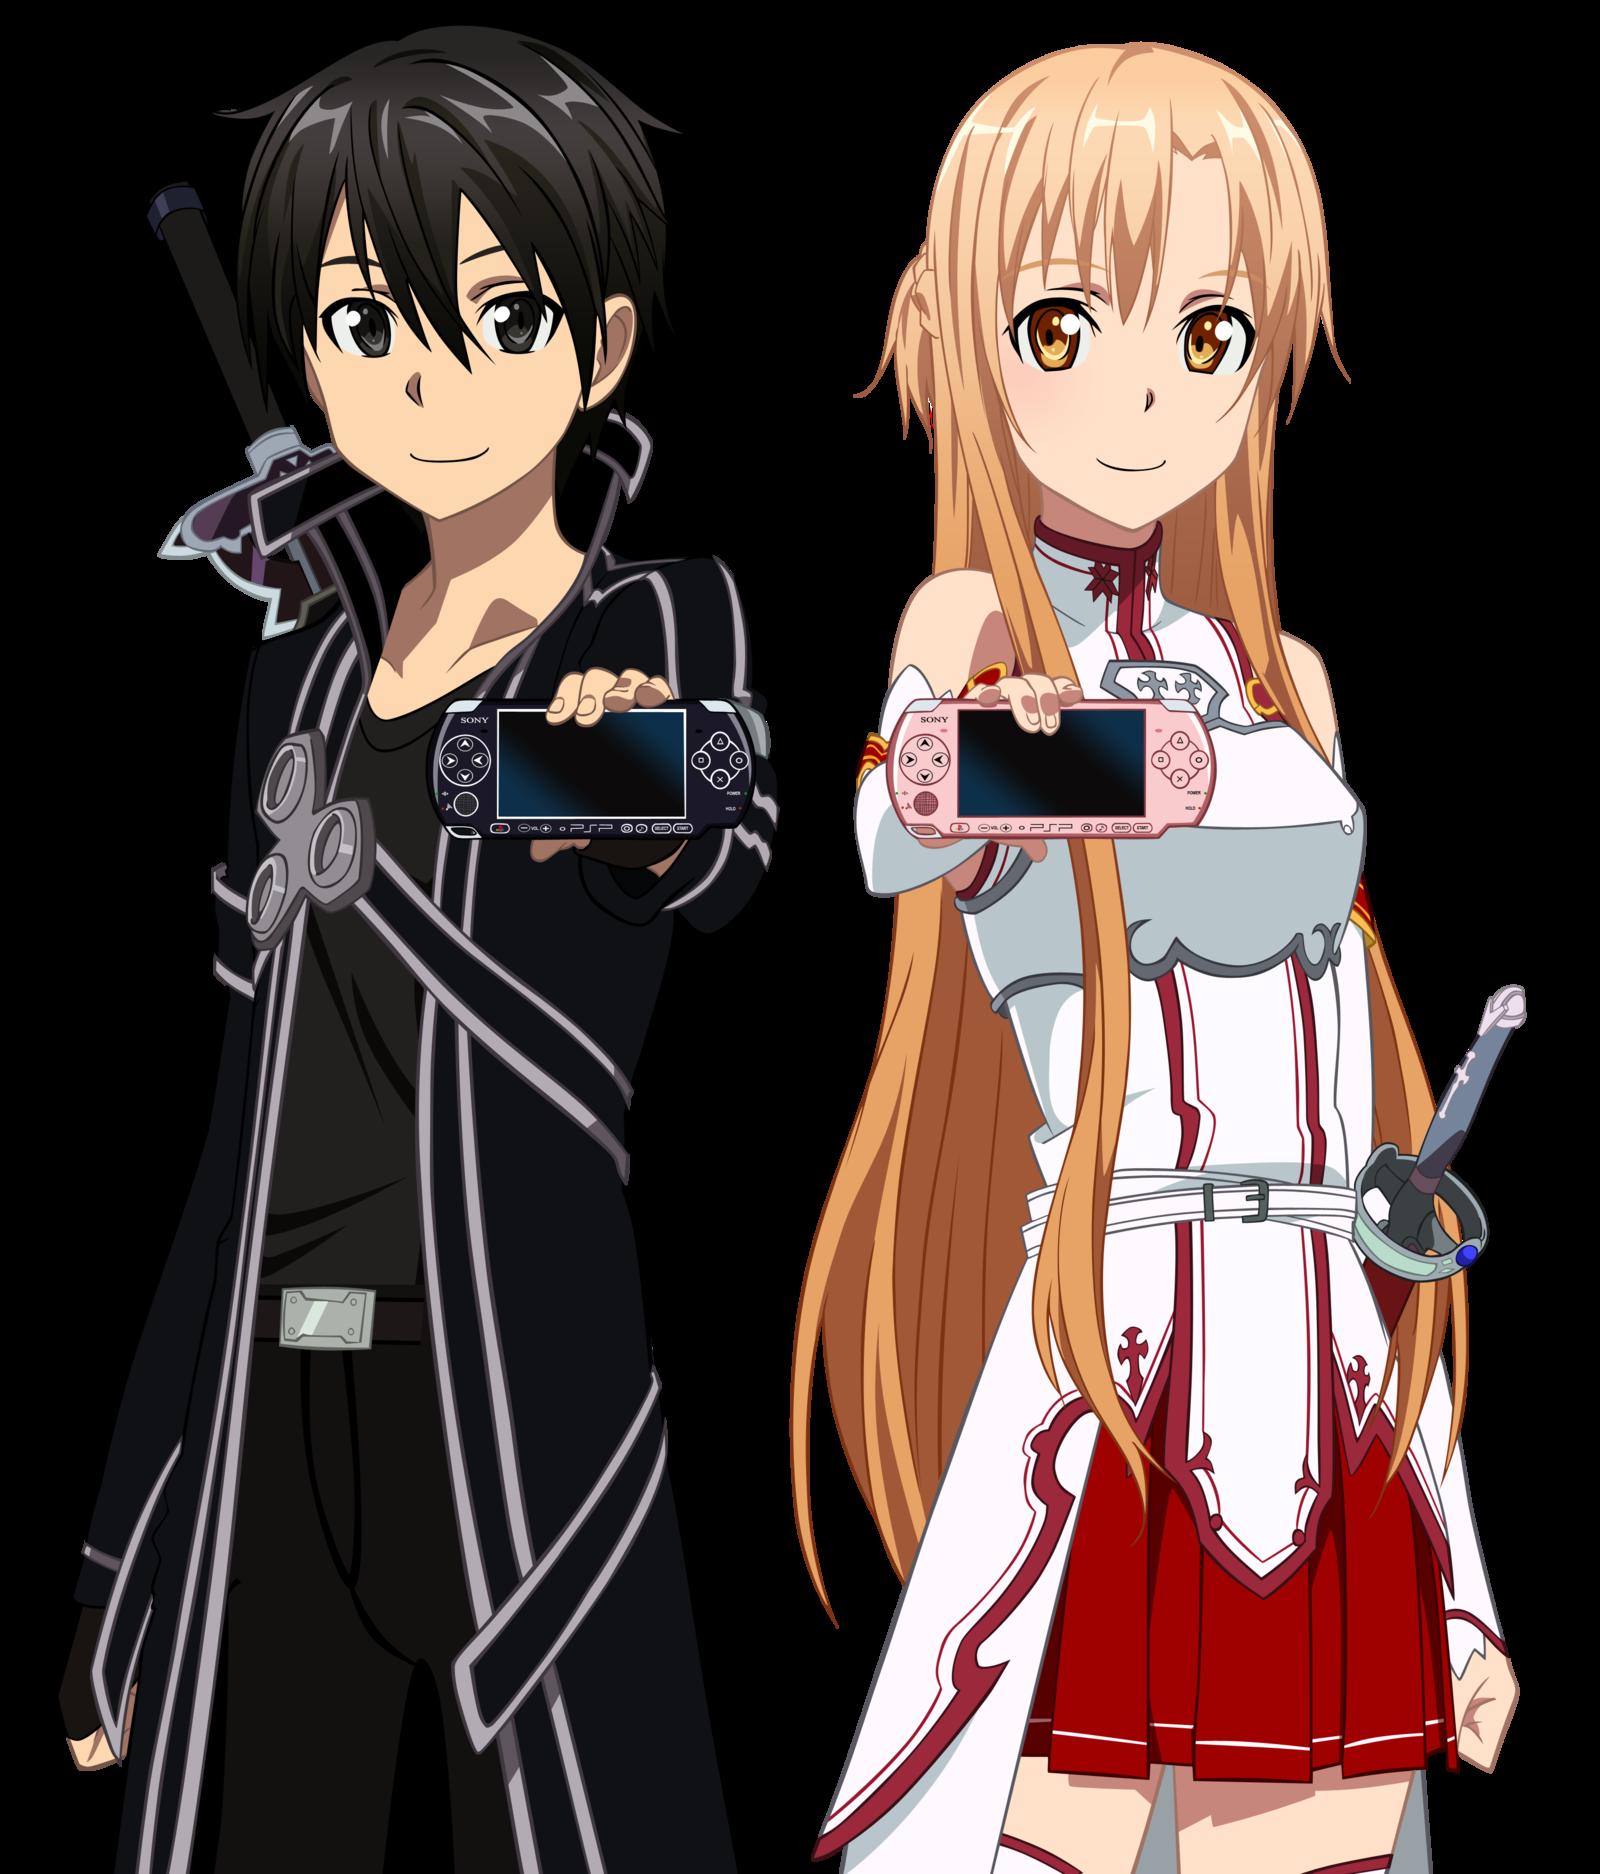 Kirito and Asuna Play Station Sword art, Sword art